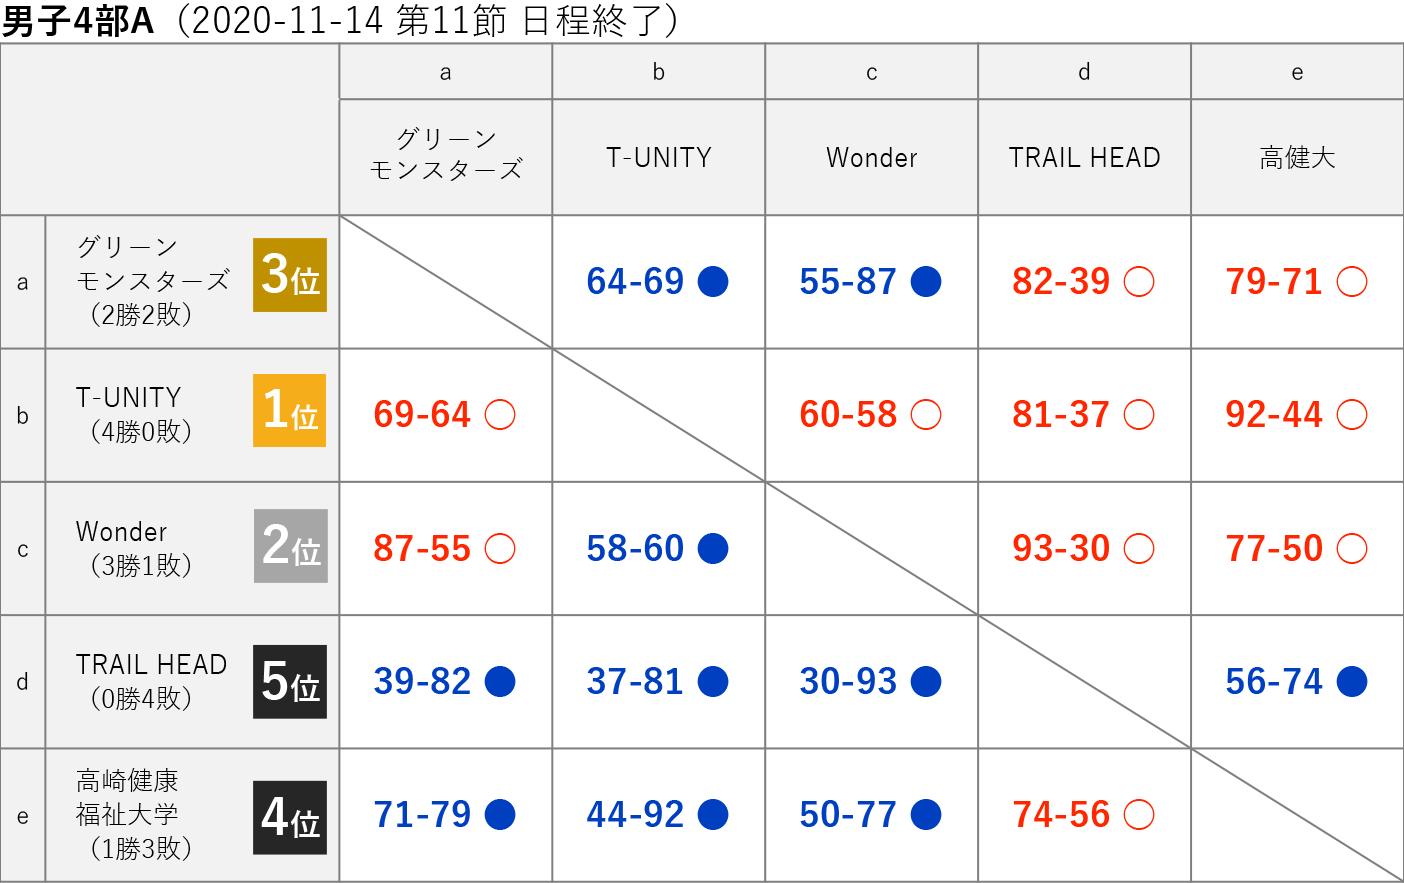 2020社会人リーグ 男子4部A 星取り表 2020-11-15(第12節日程終了)